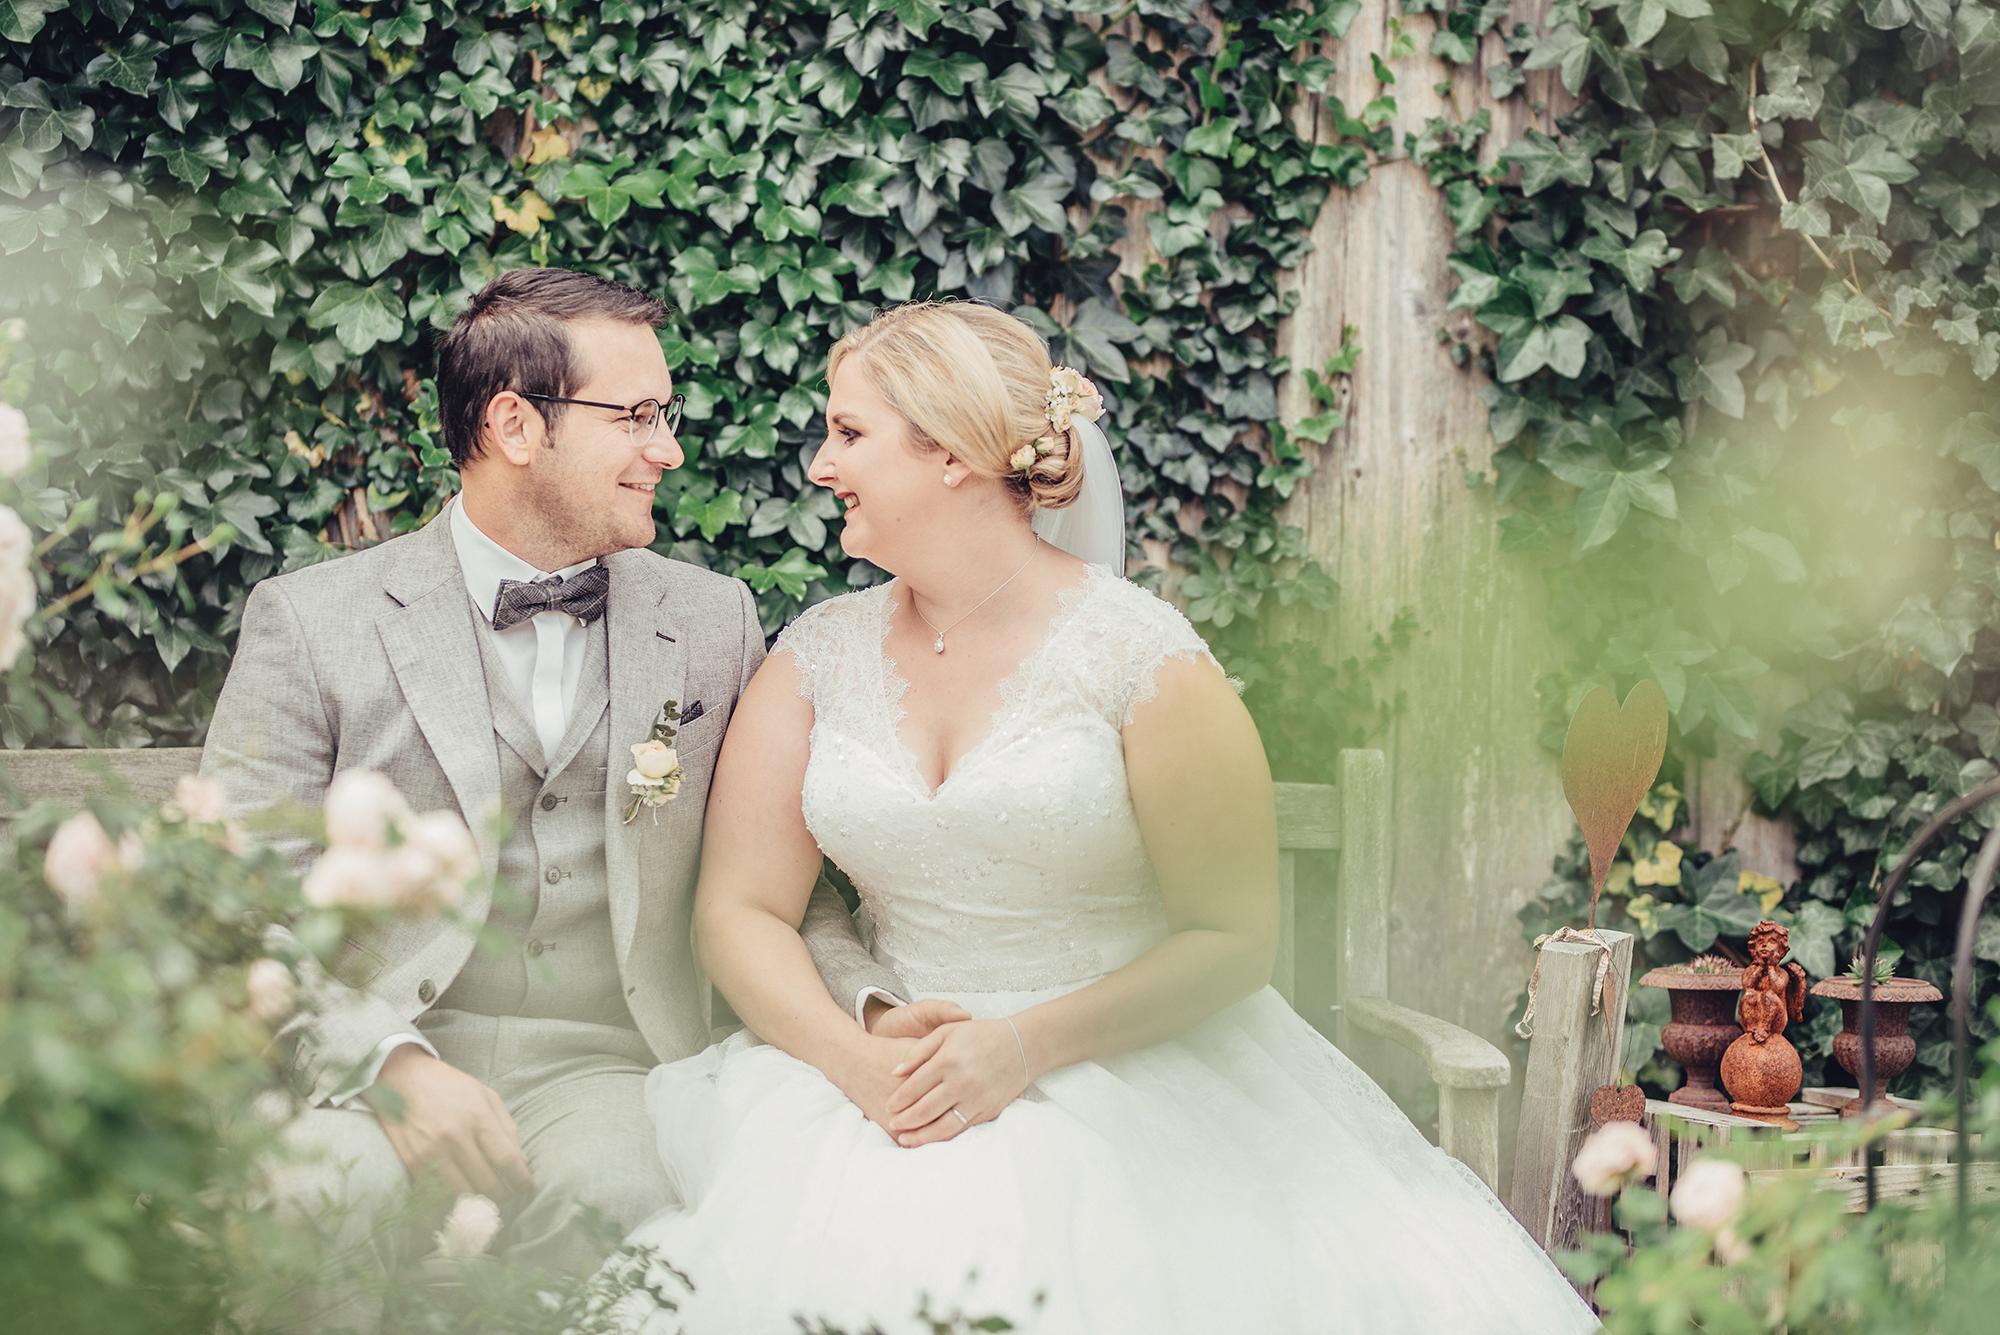 weddingseptemberluminoxx92348234130